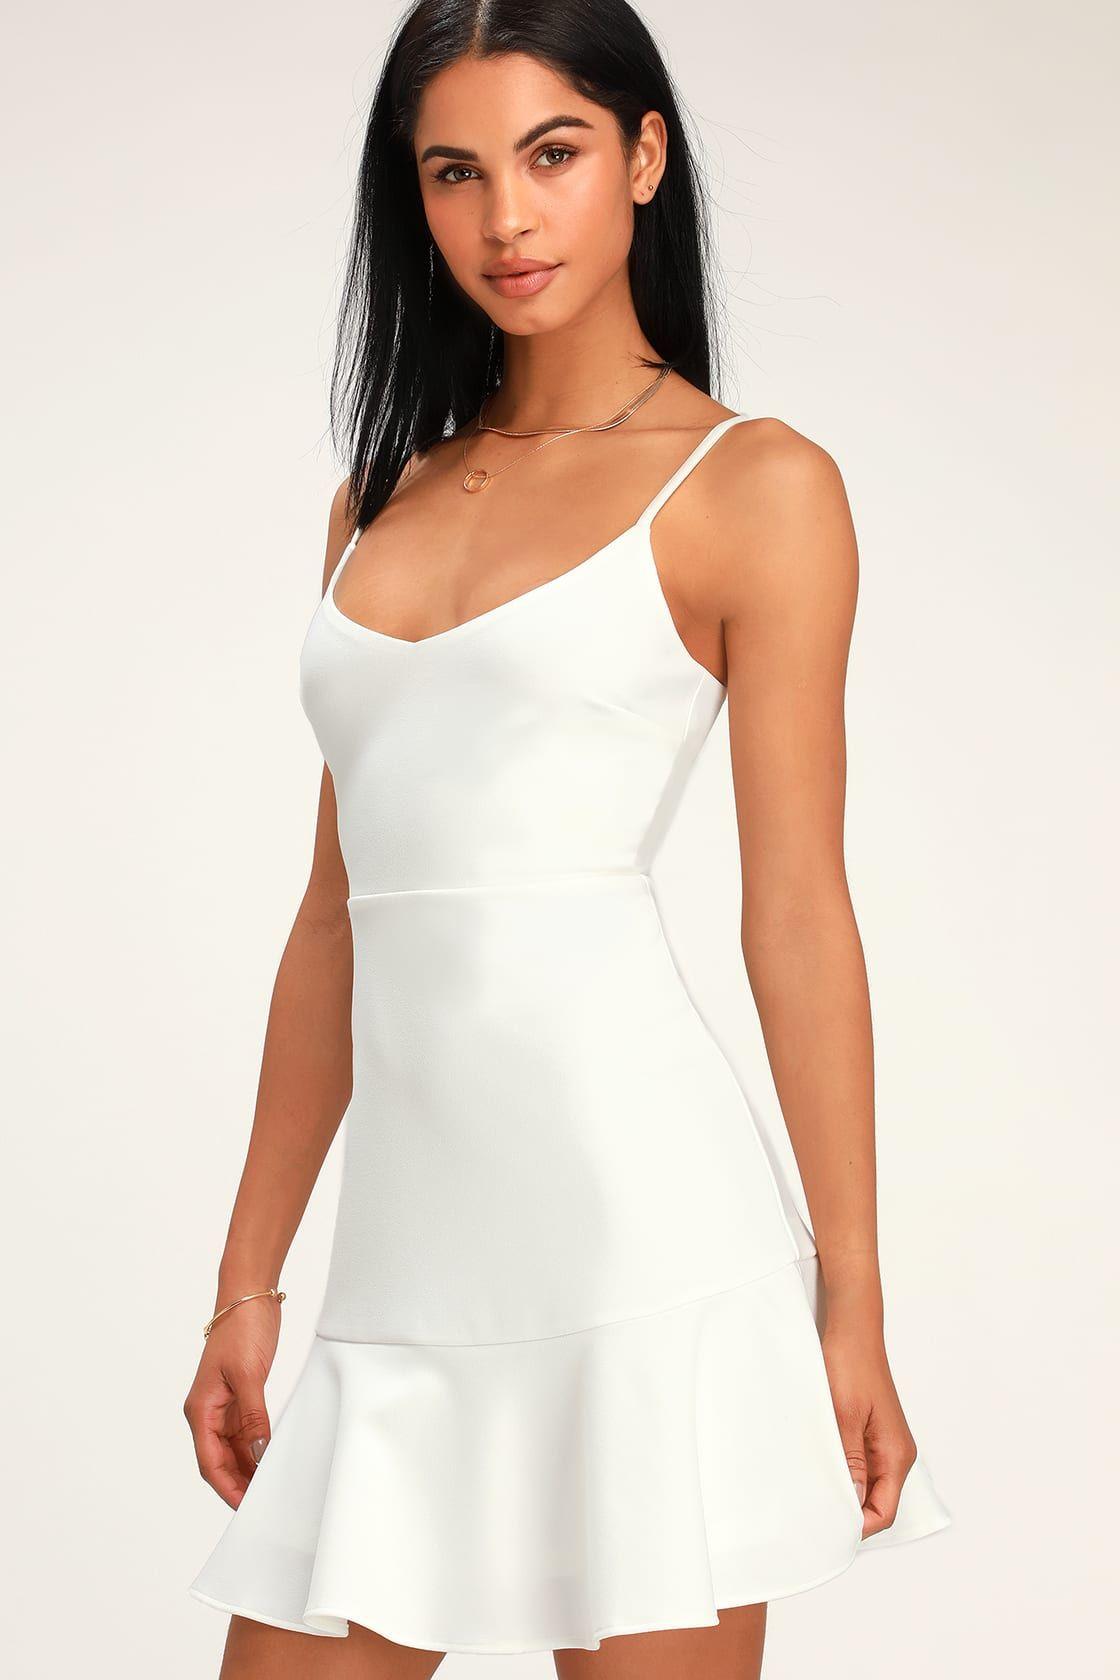 5f44582d82b Cute White Mini Dress - Little White Dress - Fit and Flare Dress